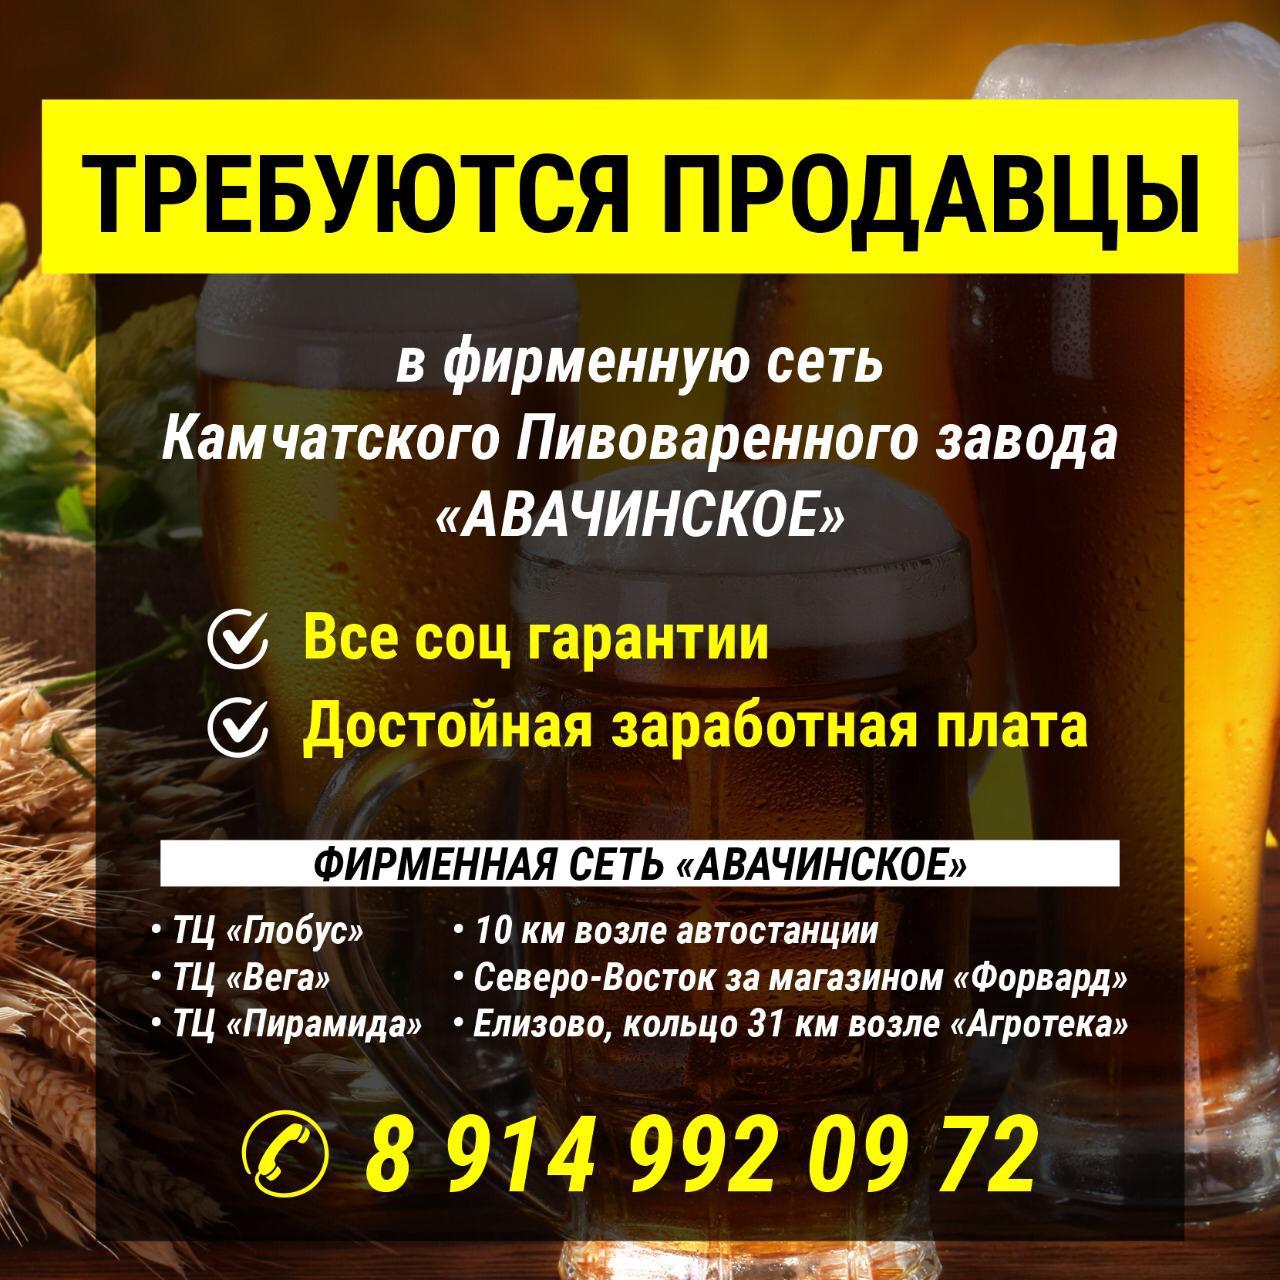 45050f62-ef09-4386-ad0a-ccf80a204b13